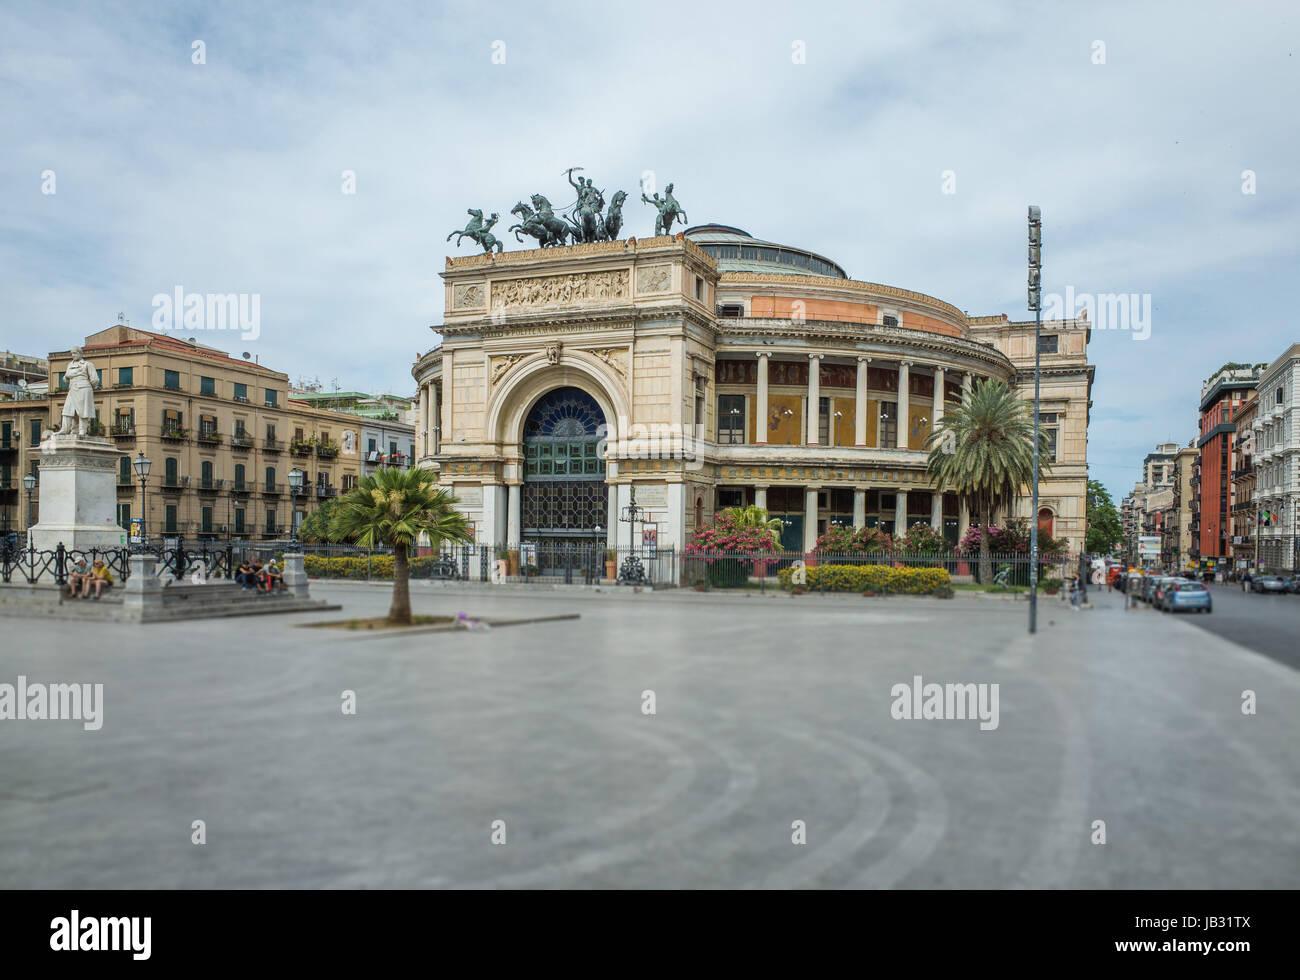 Teatro Politeama Garibaldi in Palermo, Italy Stock Photo